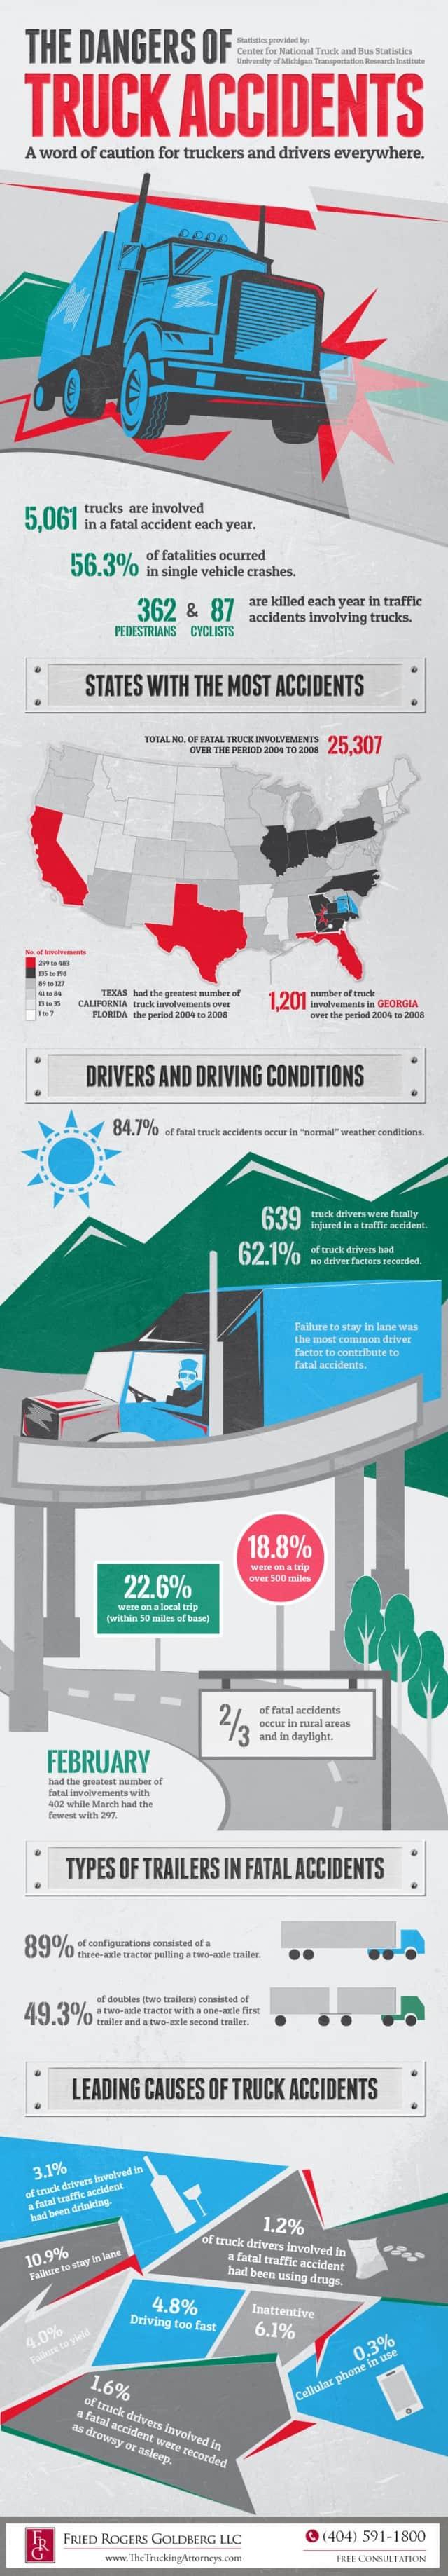 Dangers Of Truck Accidents